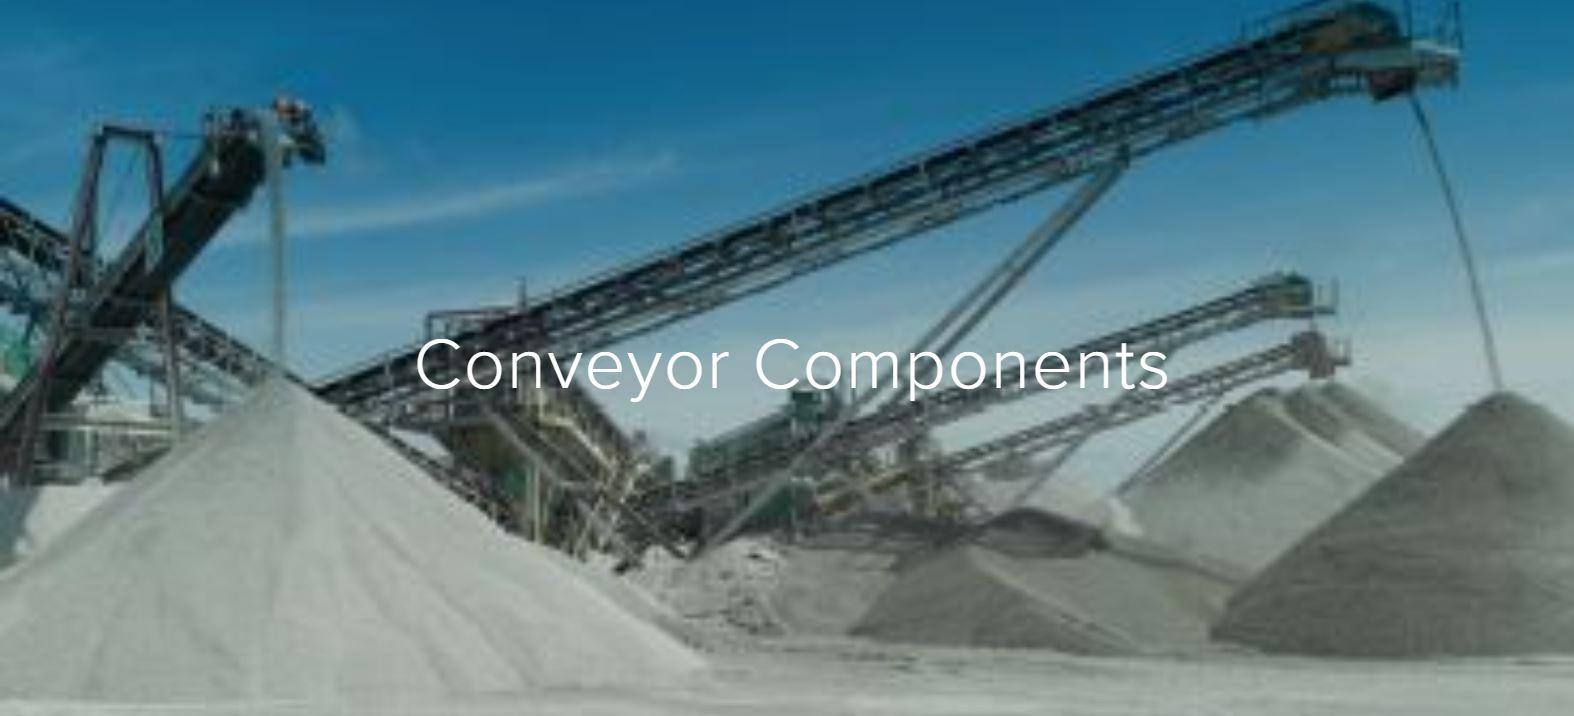 convey components